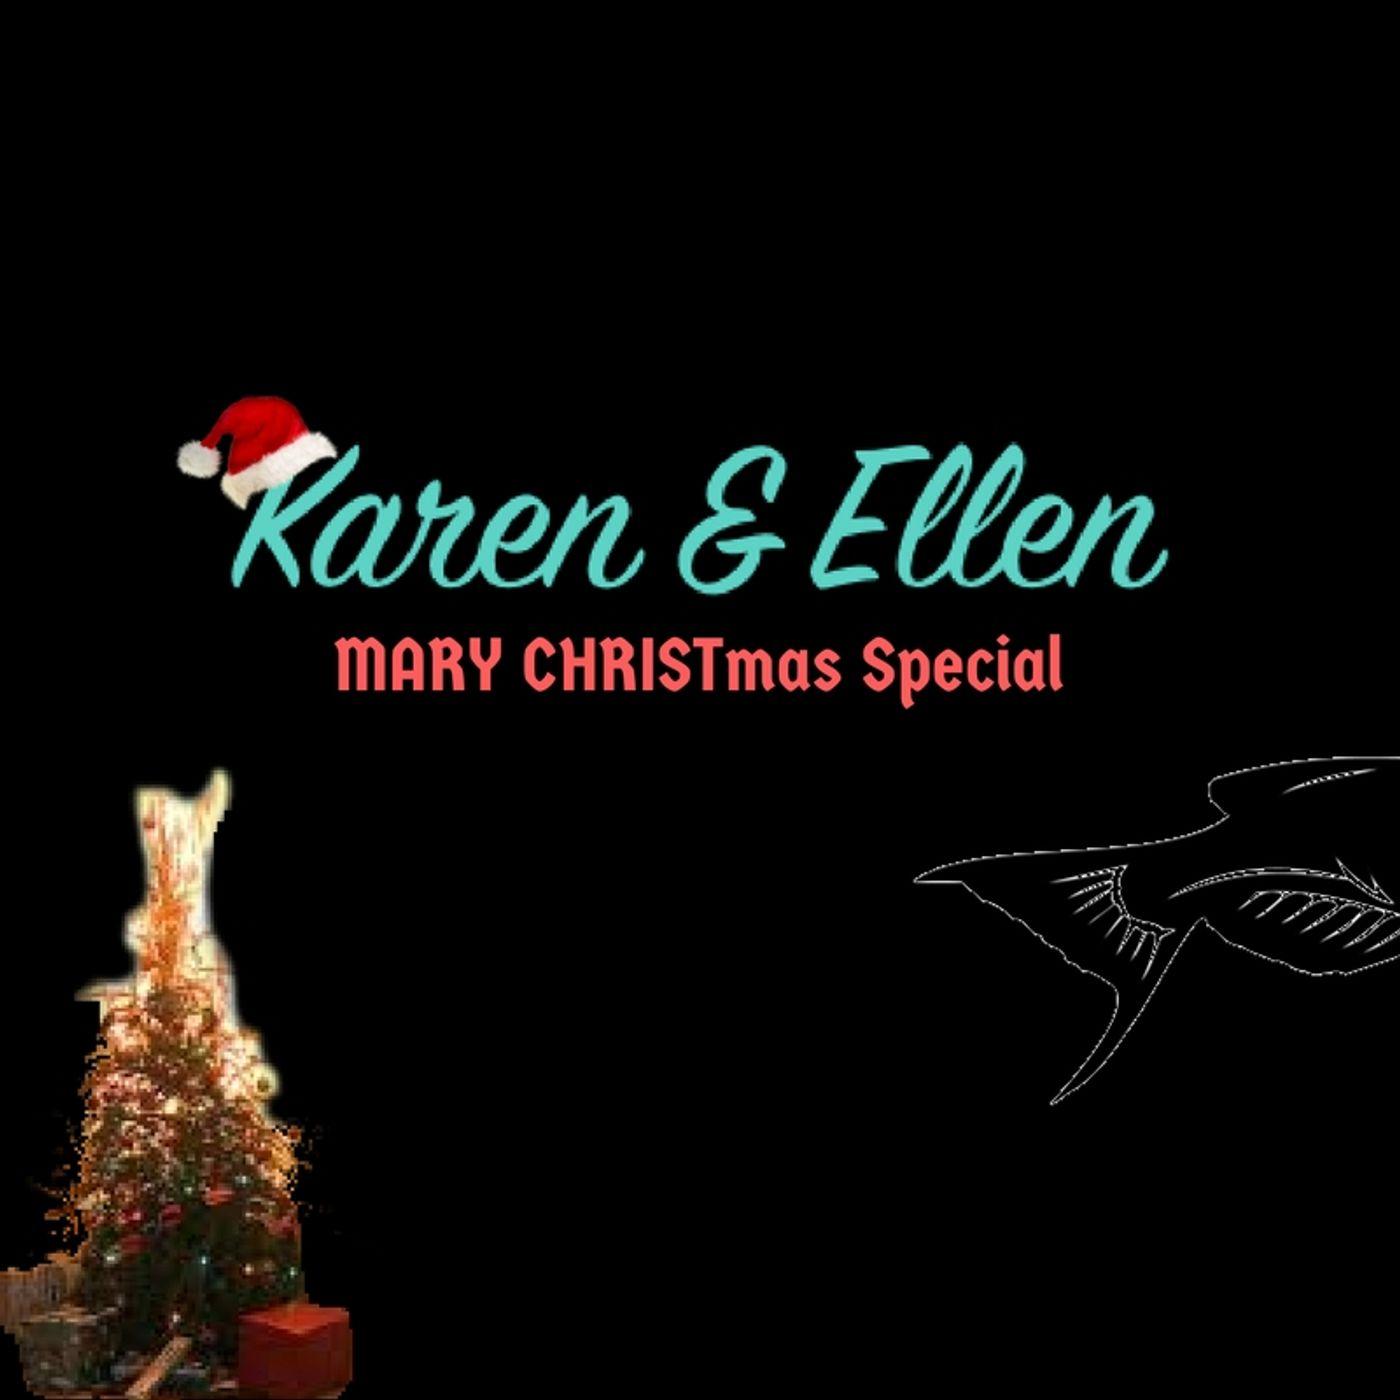 A Karen & Ellen MARY CHRISTmas Special